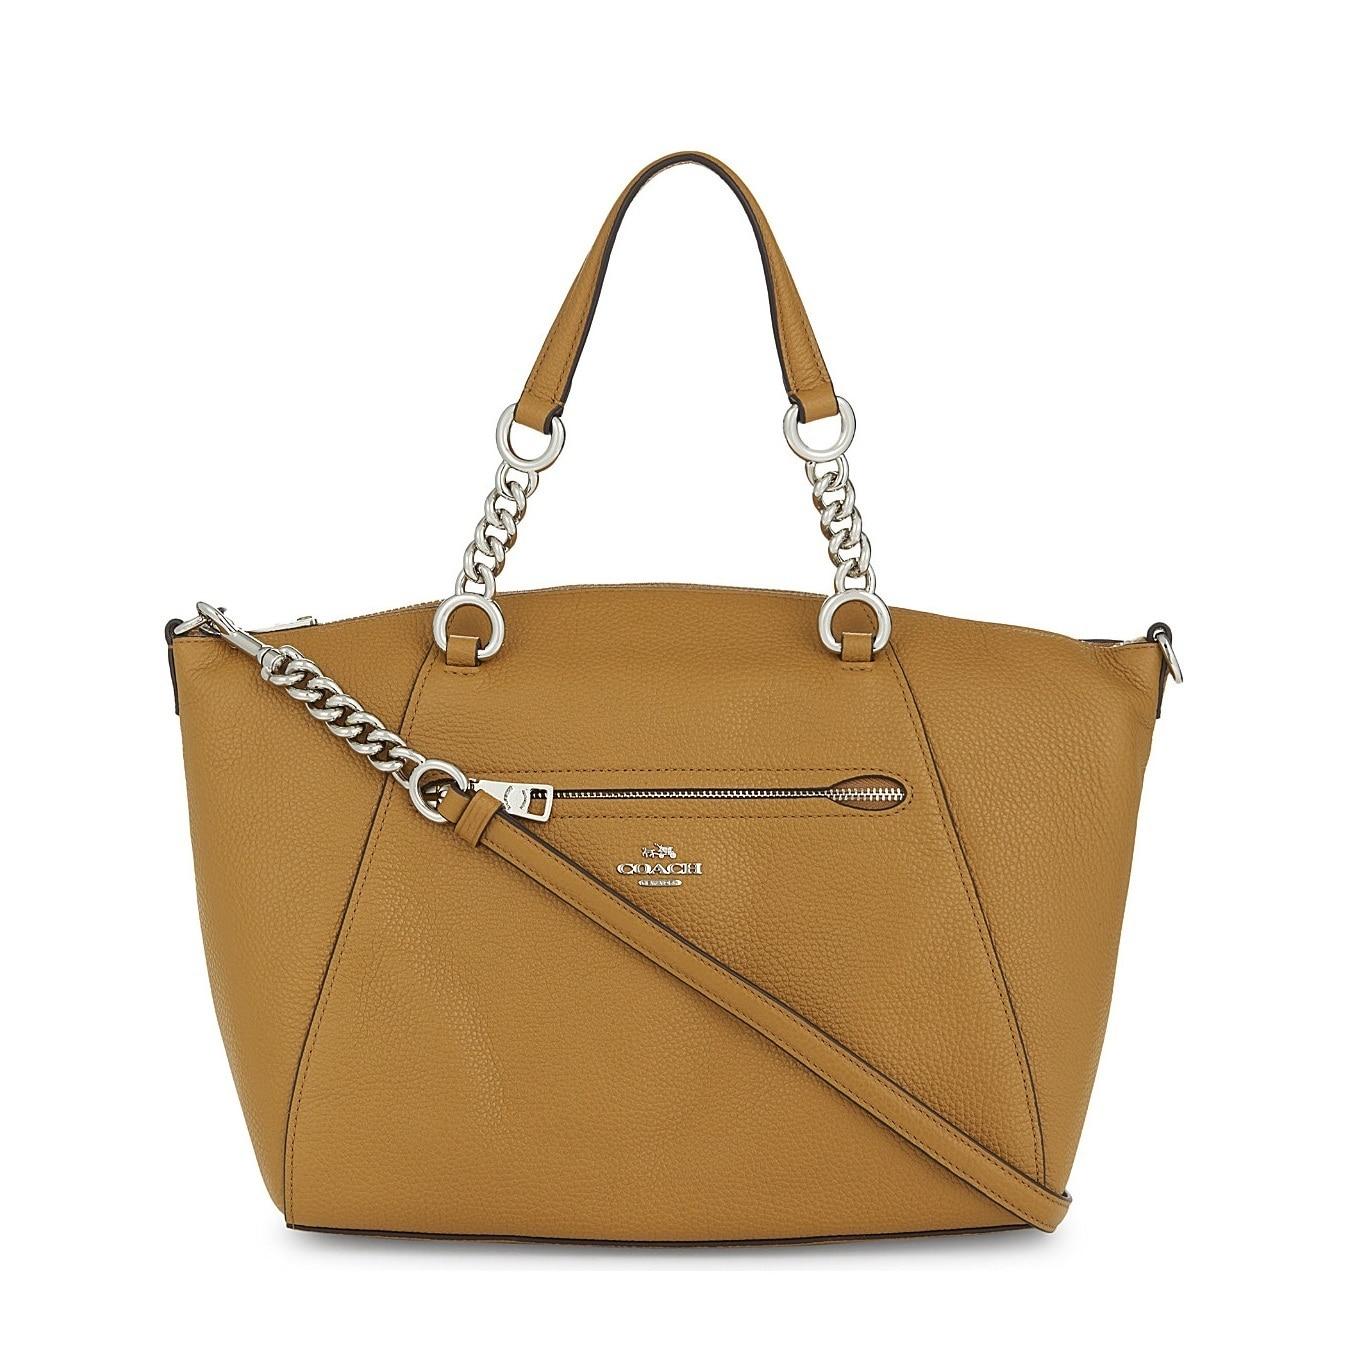 bb6560bdbf49d Shop Coach Prairie Silver Light Saddle Chain Satchel Handbag - Free  Shipping Today - Overstock - 18967511